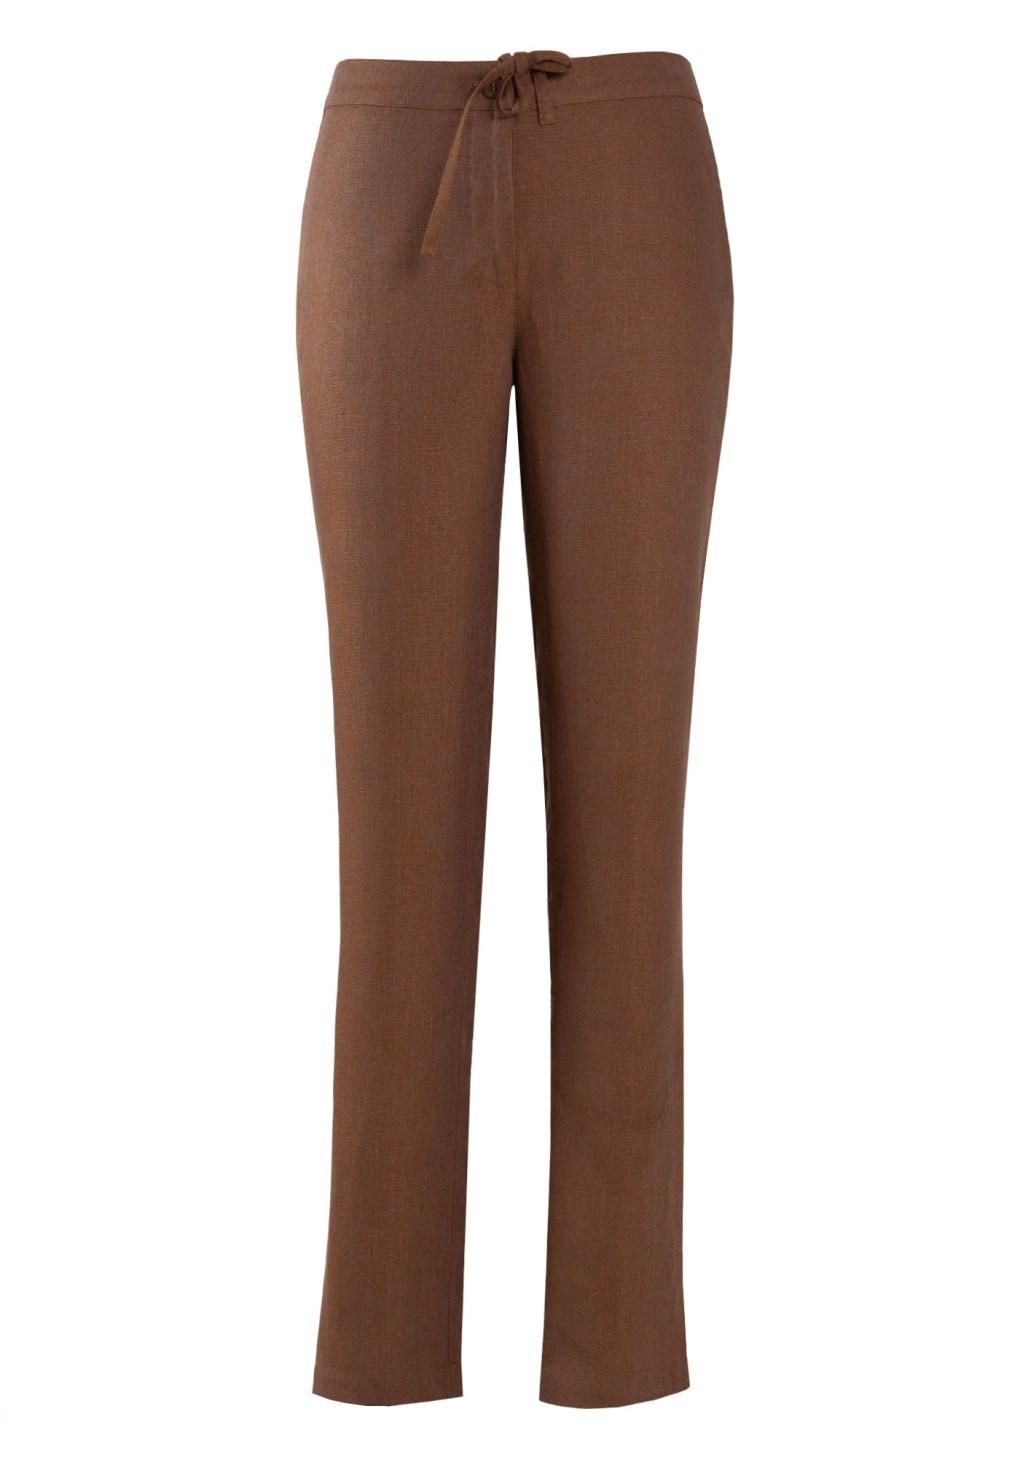 MINC ecofashion Womens Narrow Trousers in Brown Linen